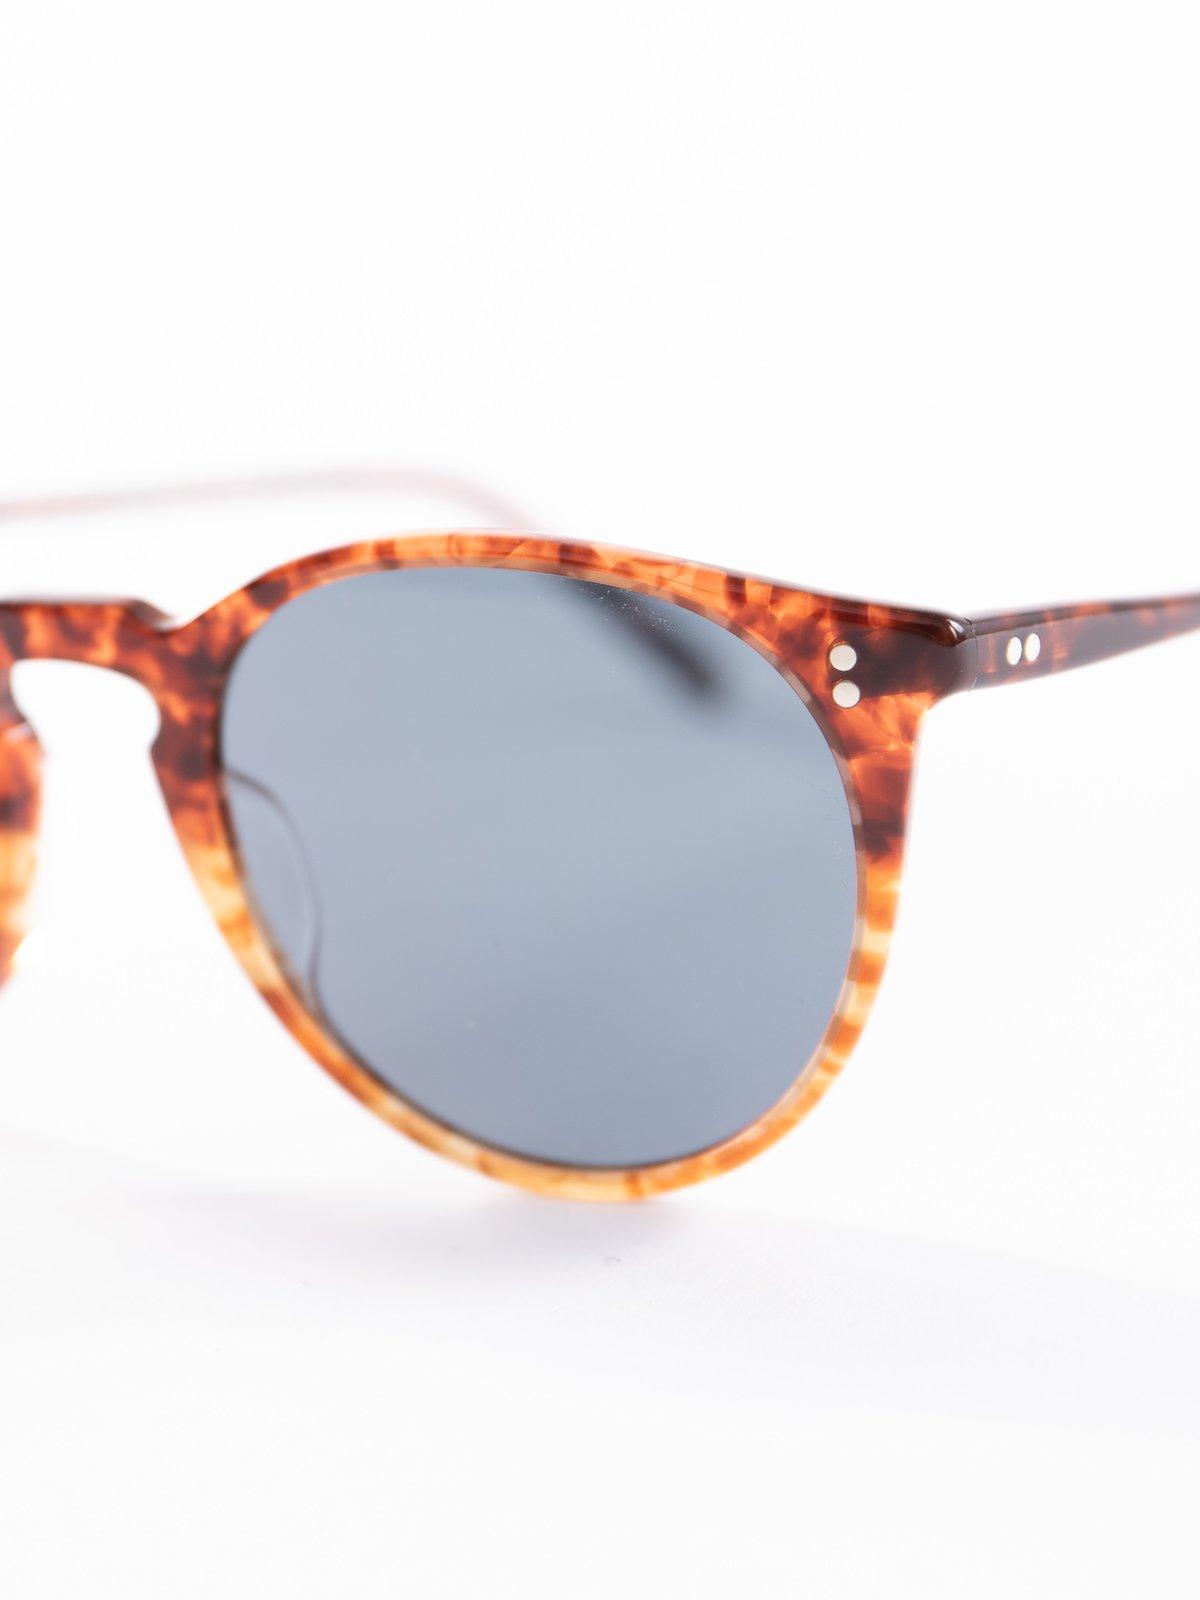 Vintage 1282/Blue Photochromic O'Malley Sunglasses - Image 3